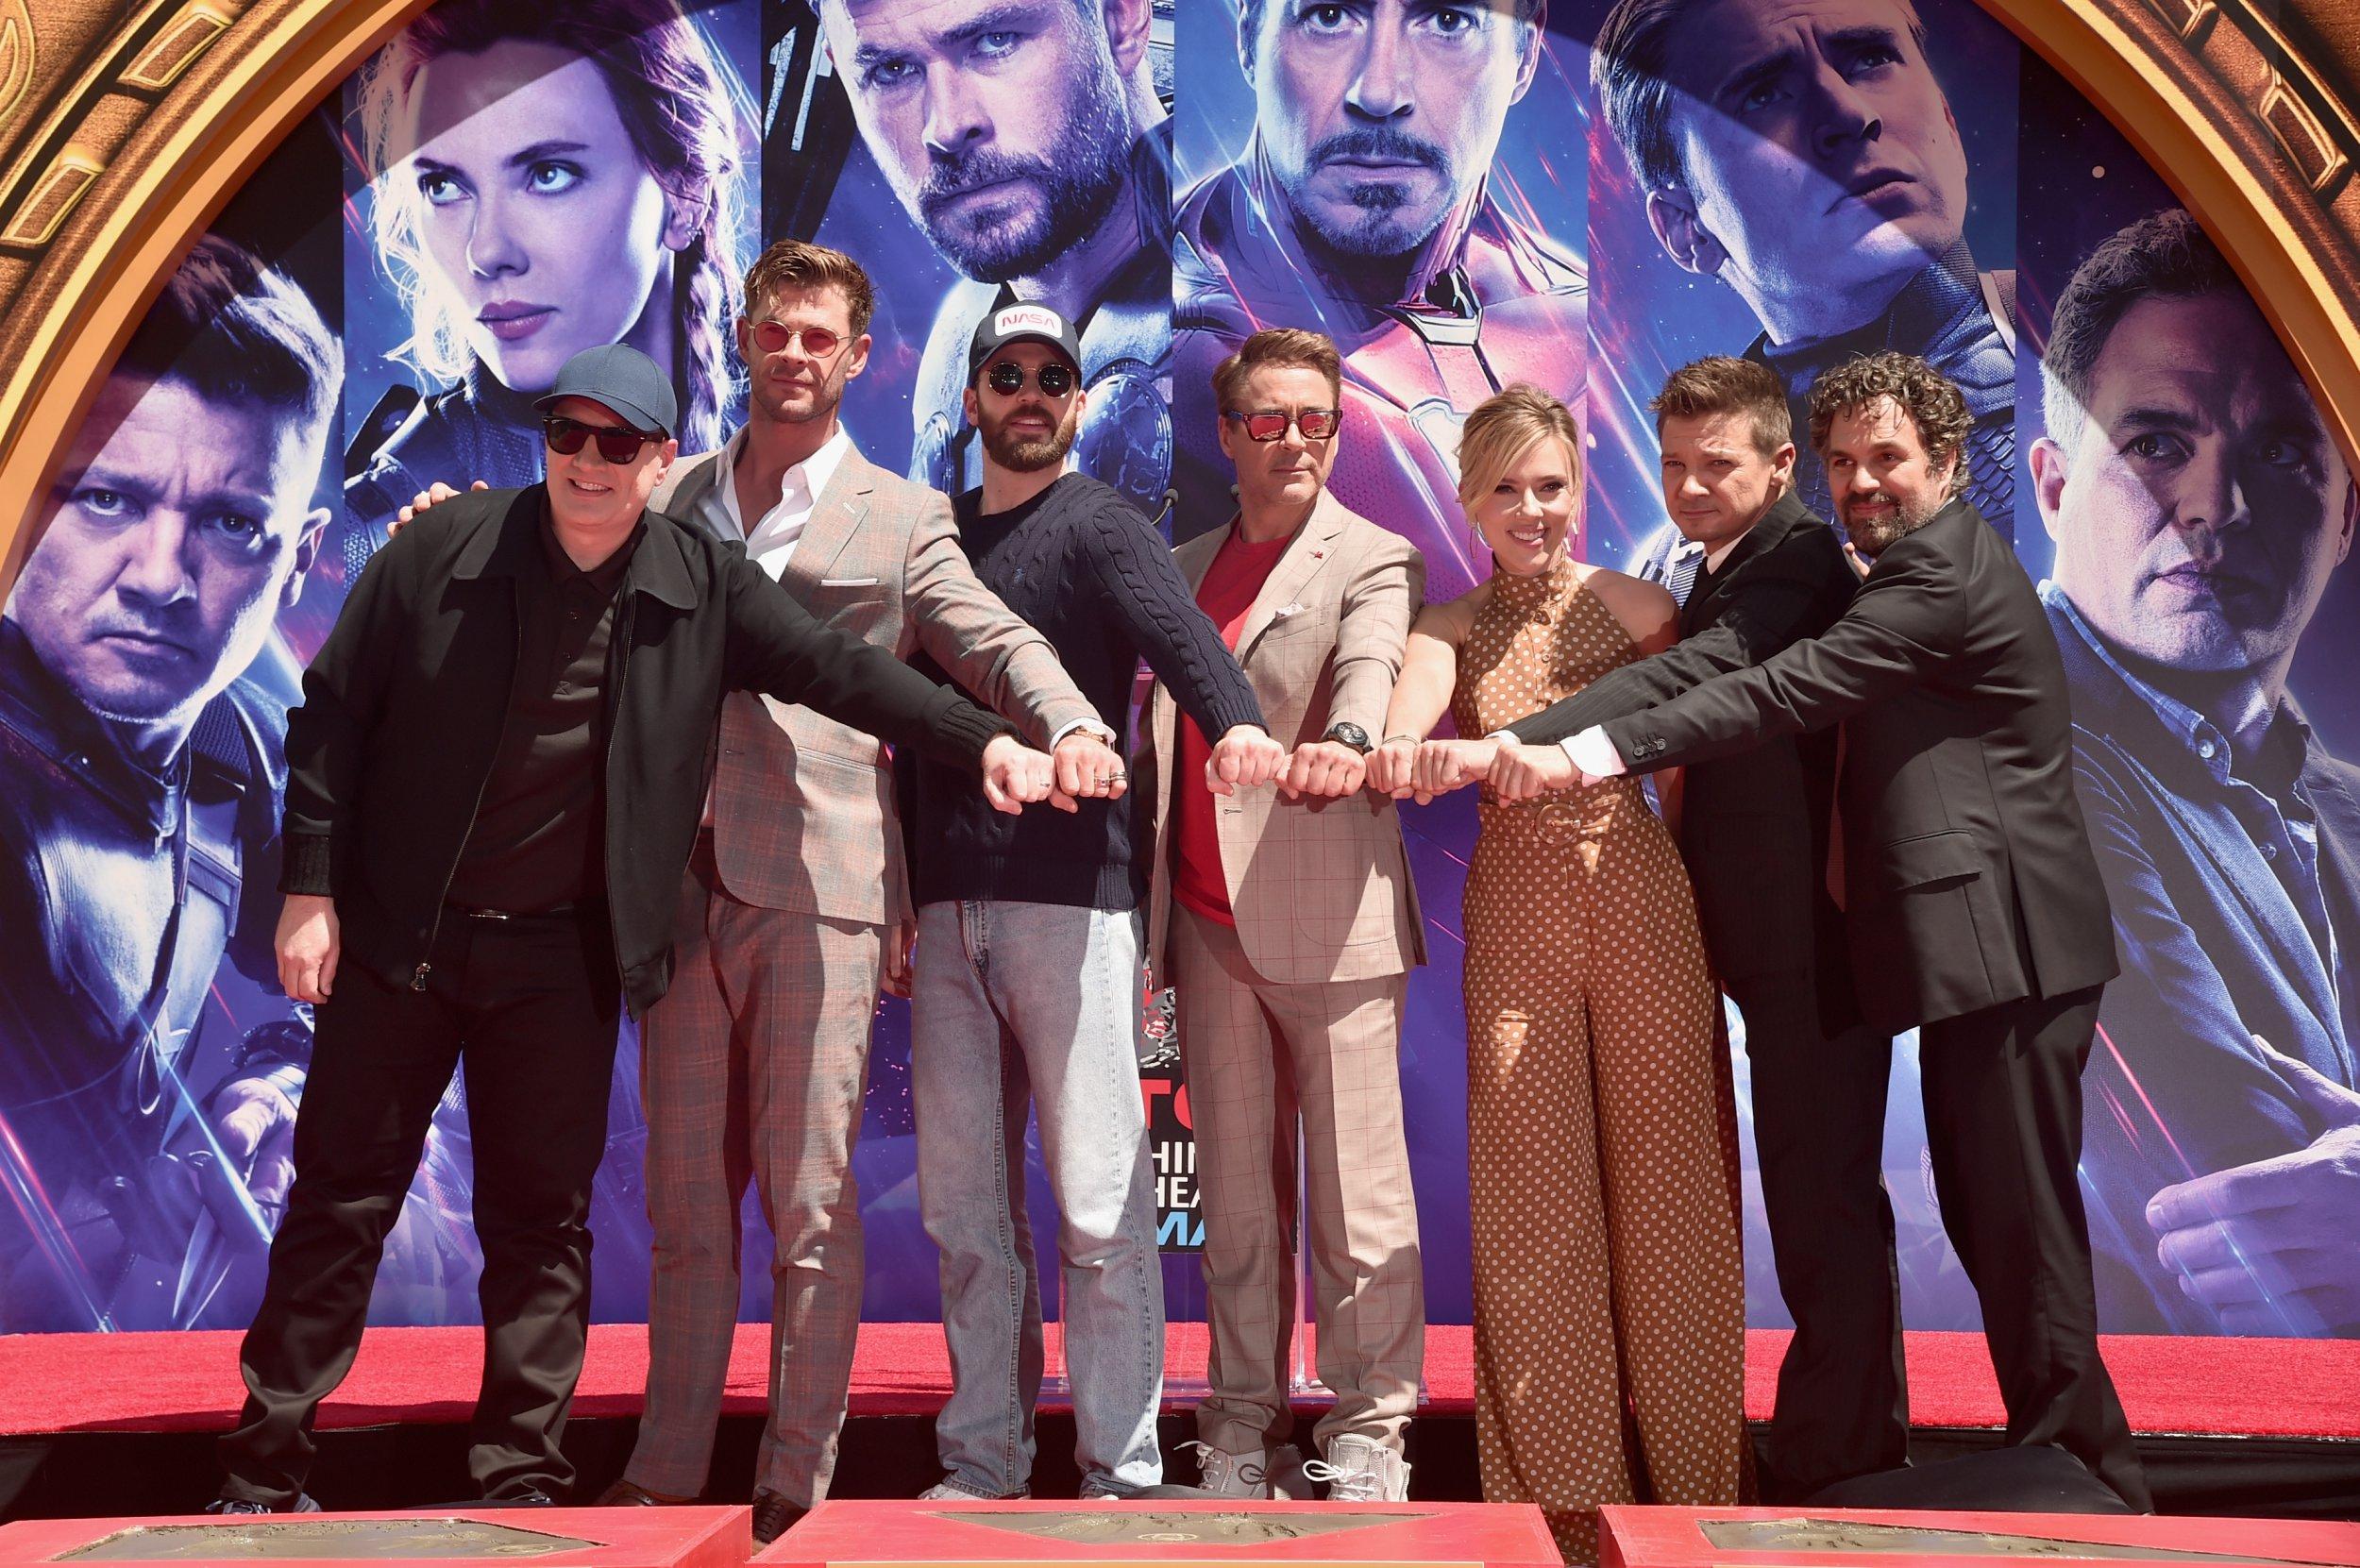 Is Avengers: Endgame the last Marvel movie for the original cast?